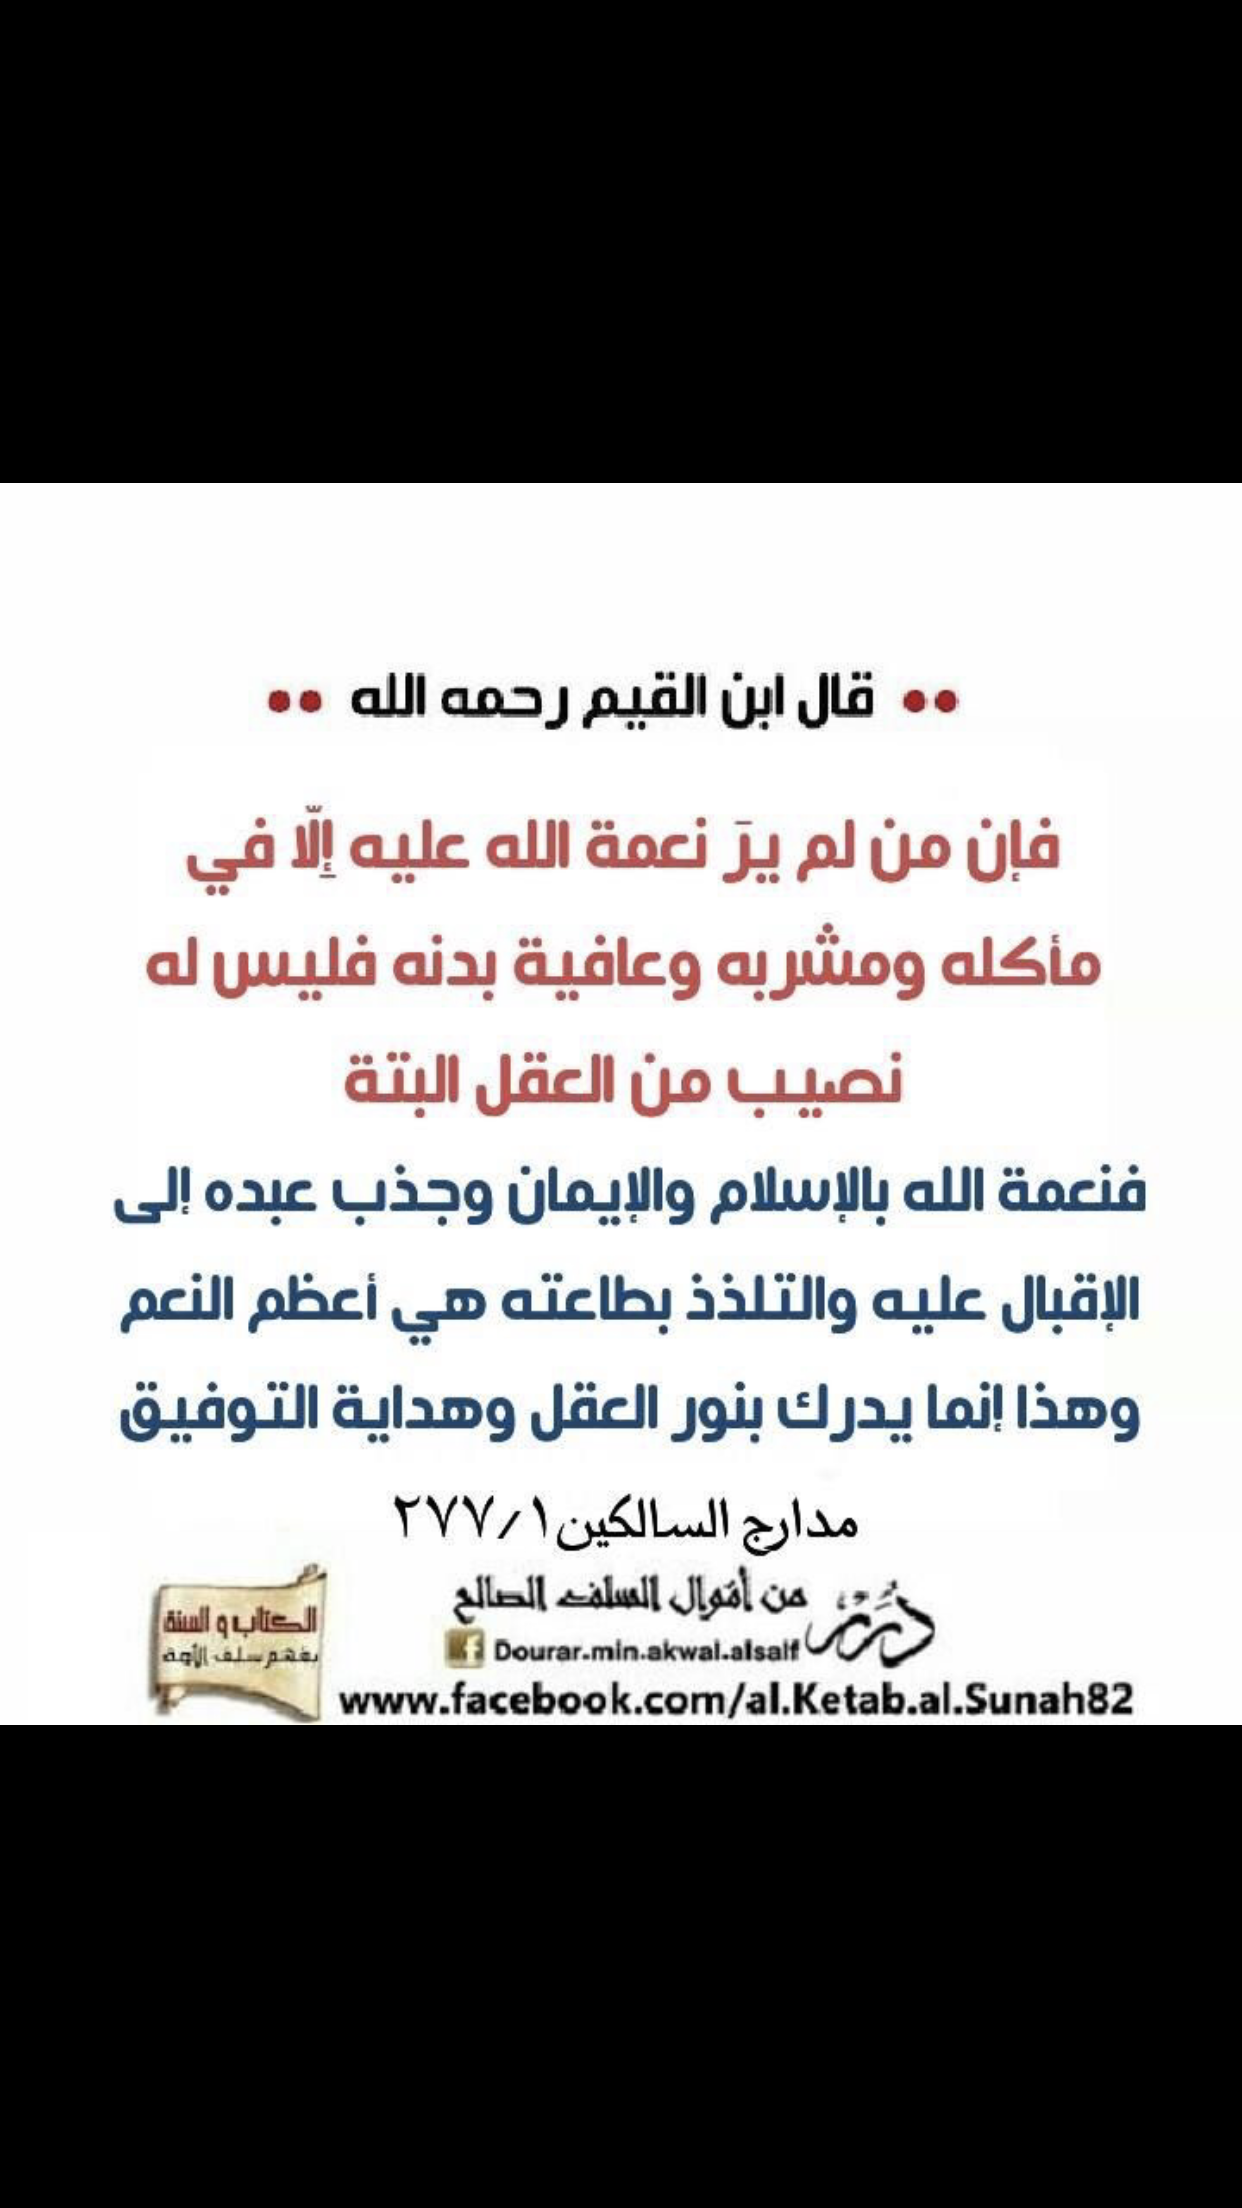 Pin By Nesma Abdelrahman On ابن القيم Islam Facts Islam Quran Islam